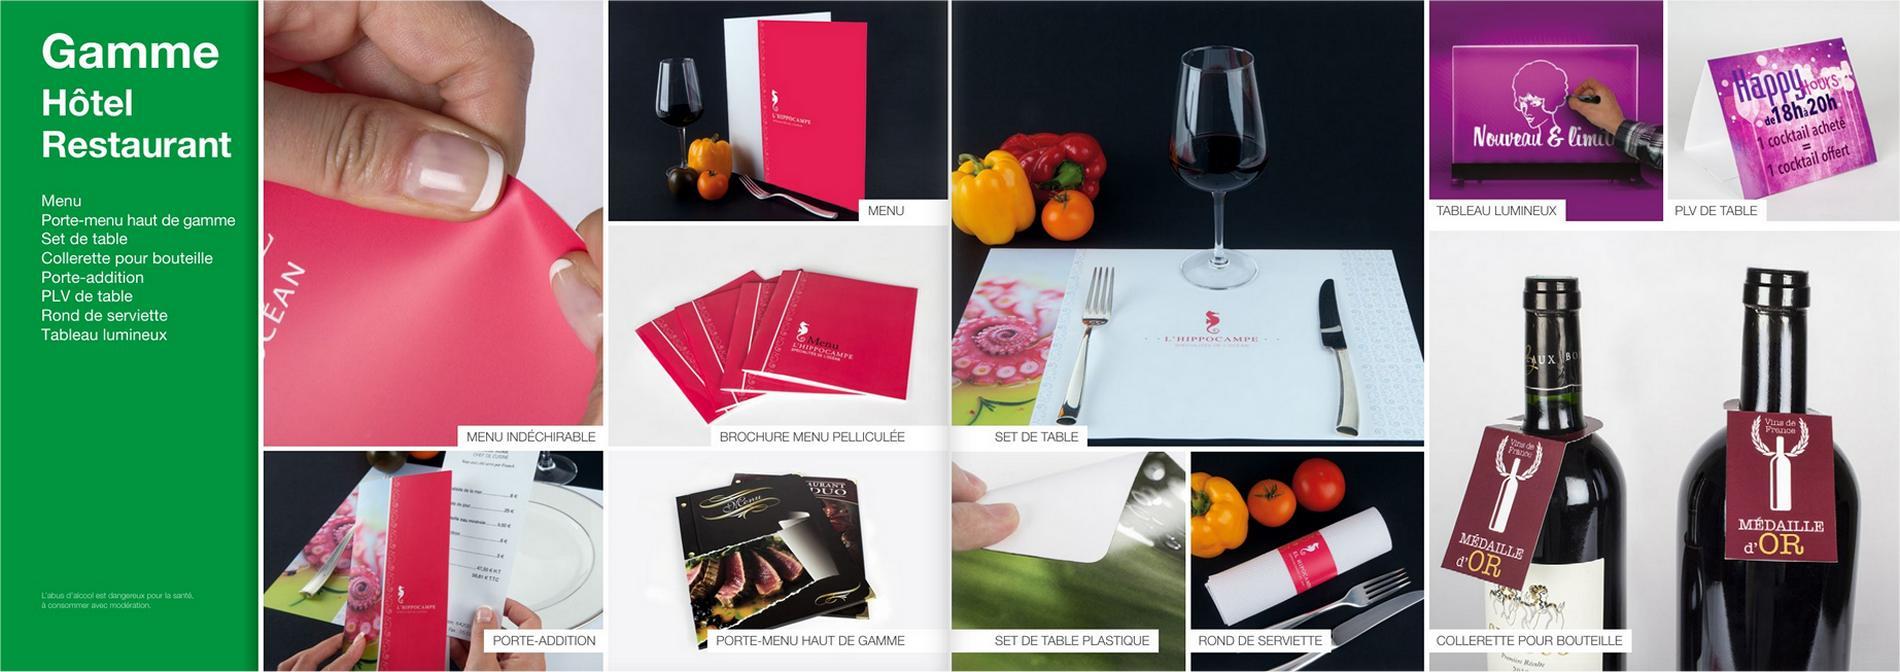 imprimeur-hotel-restaurant-yvelines-78